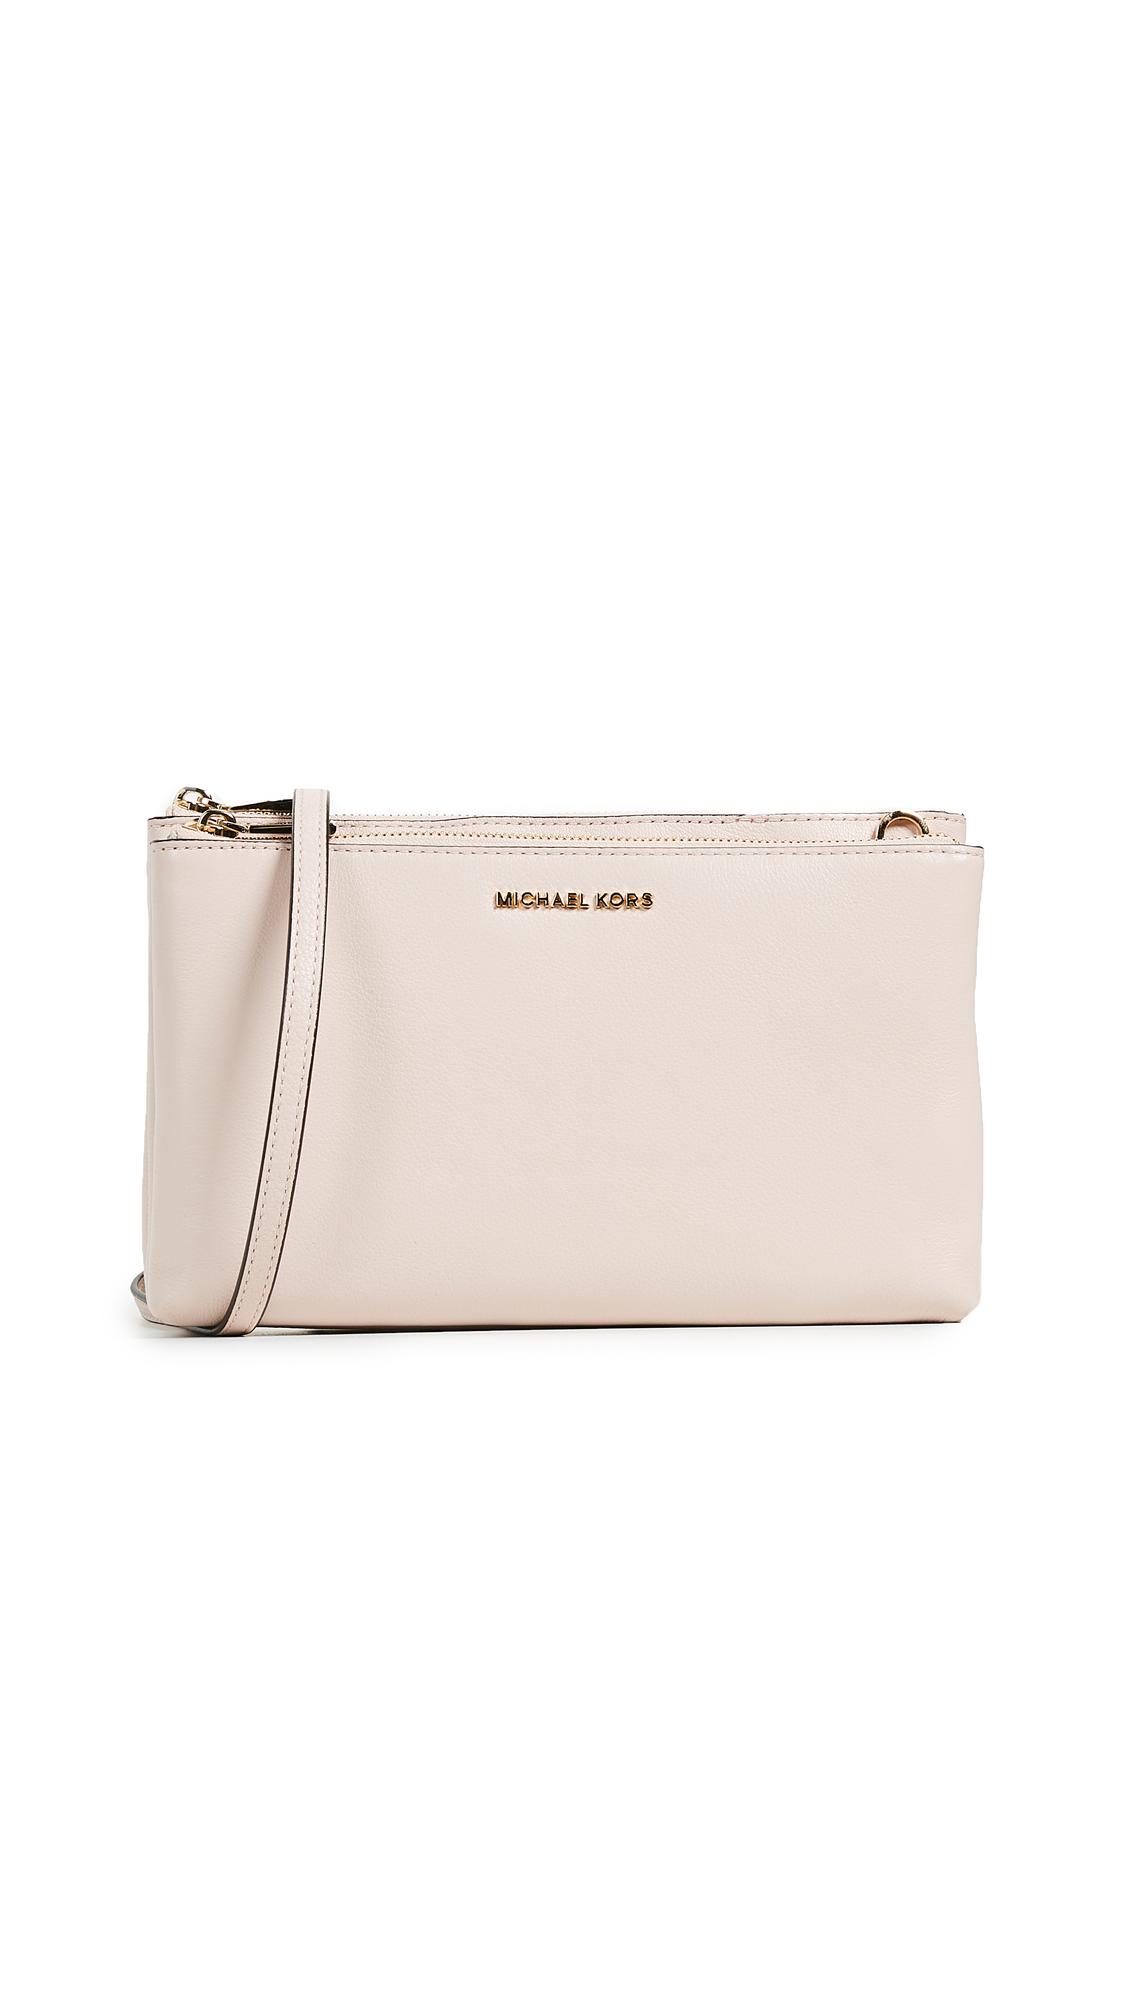 Michael Michael Kors Double Zip Cross Body Bag In Soft Pink ... 2ae6deb921237